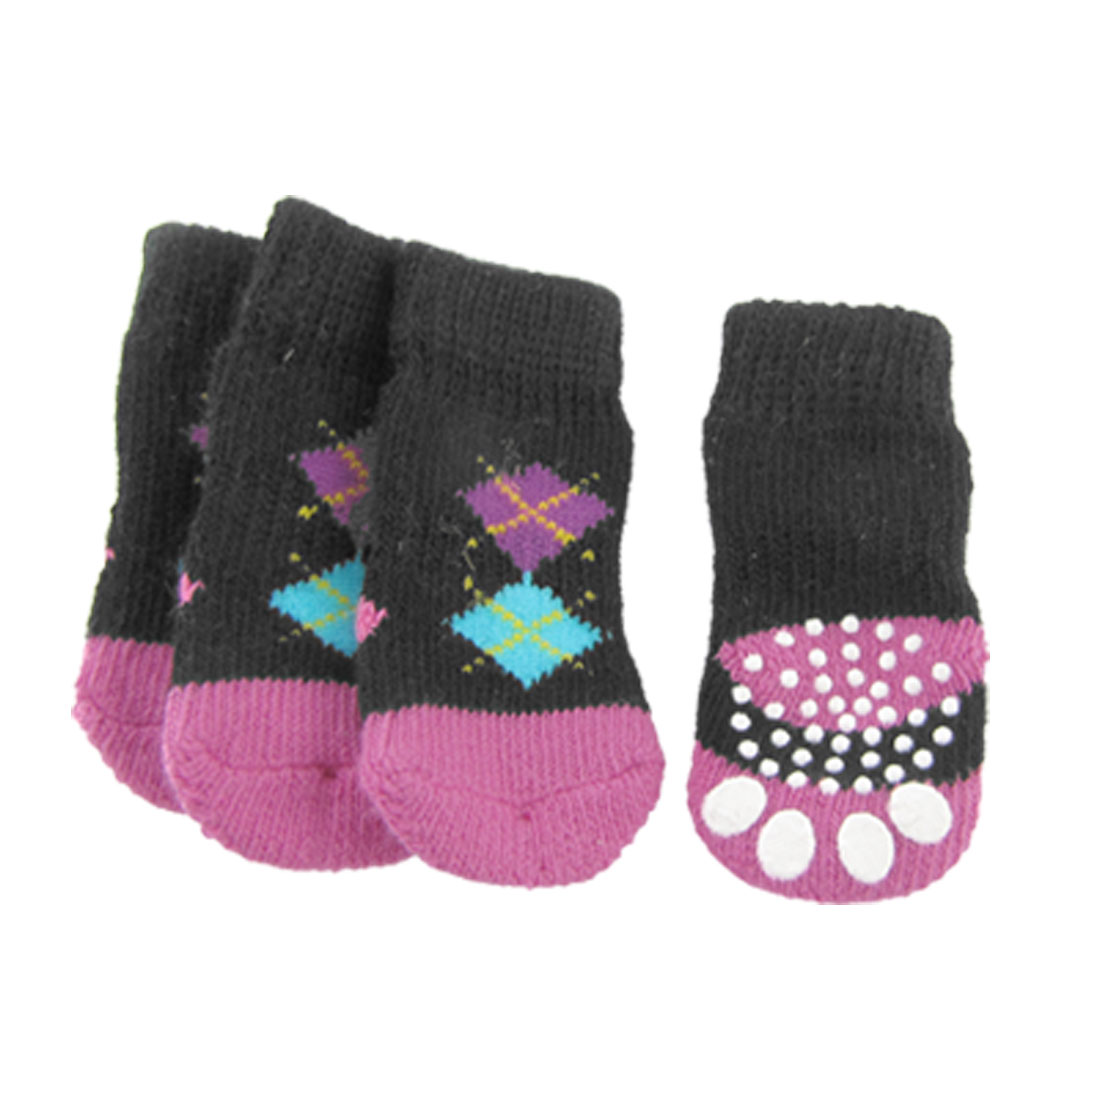 Colorful Antiskid Elastic Pet Dog Knitting Printed Socks